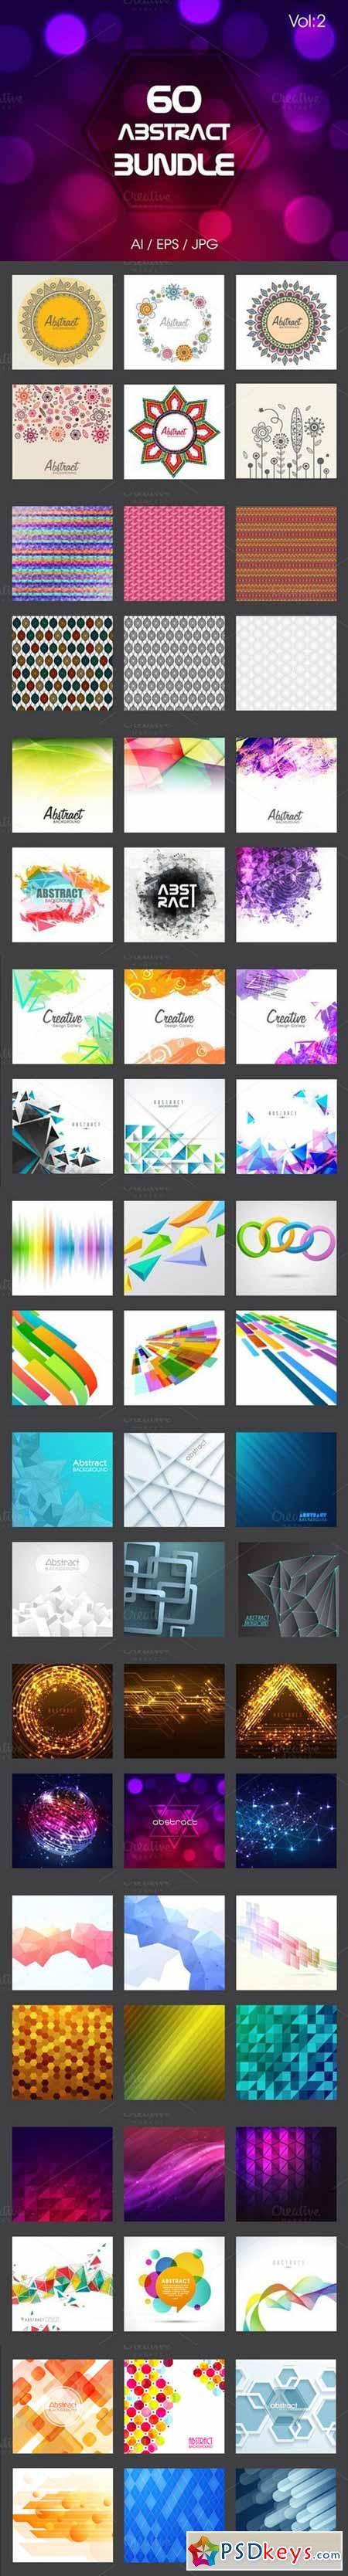 Creative Abstract Bundle - Vol 2 470488